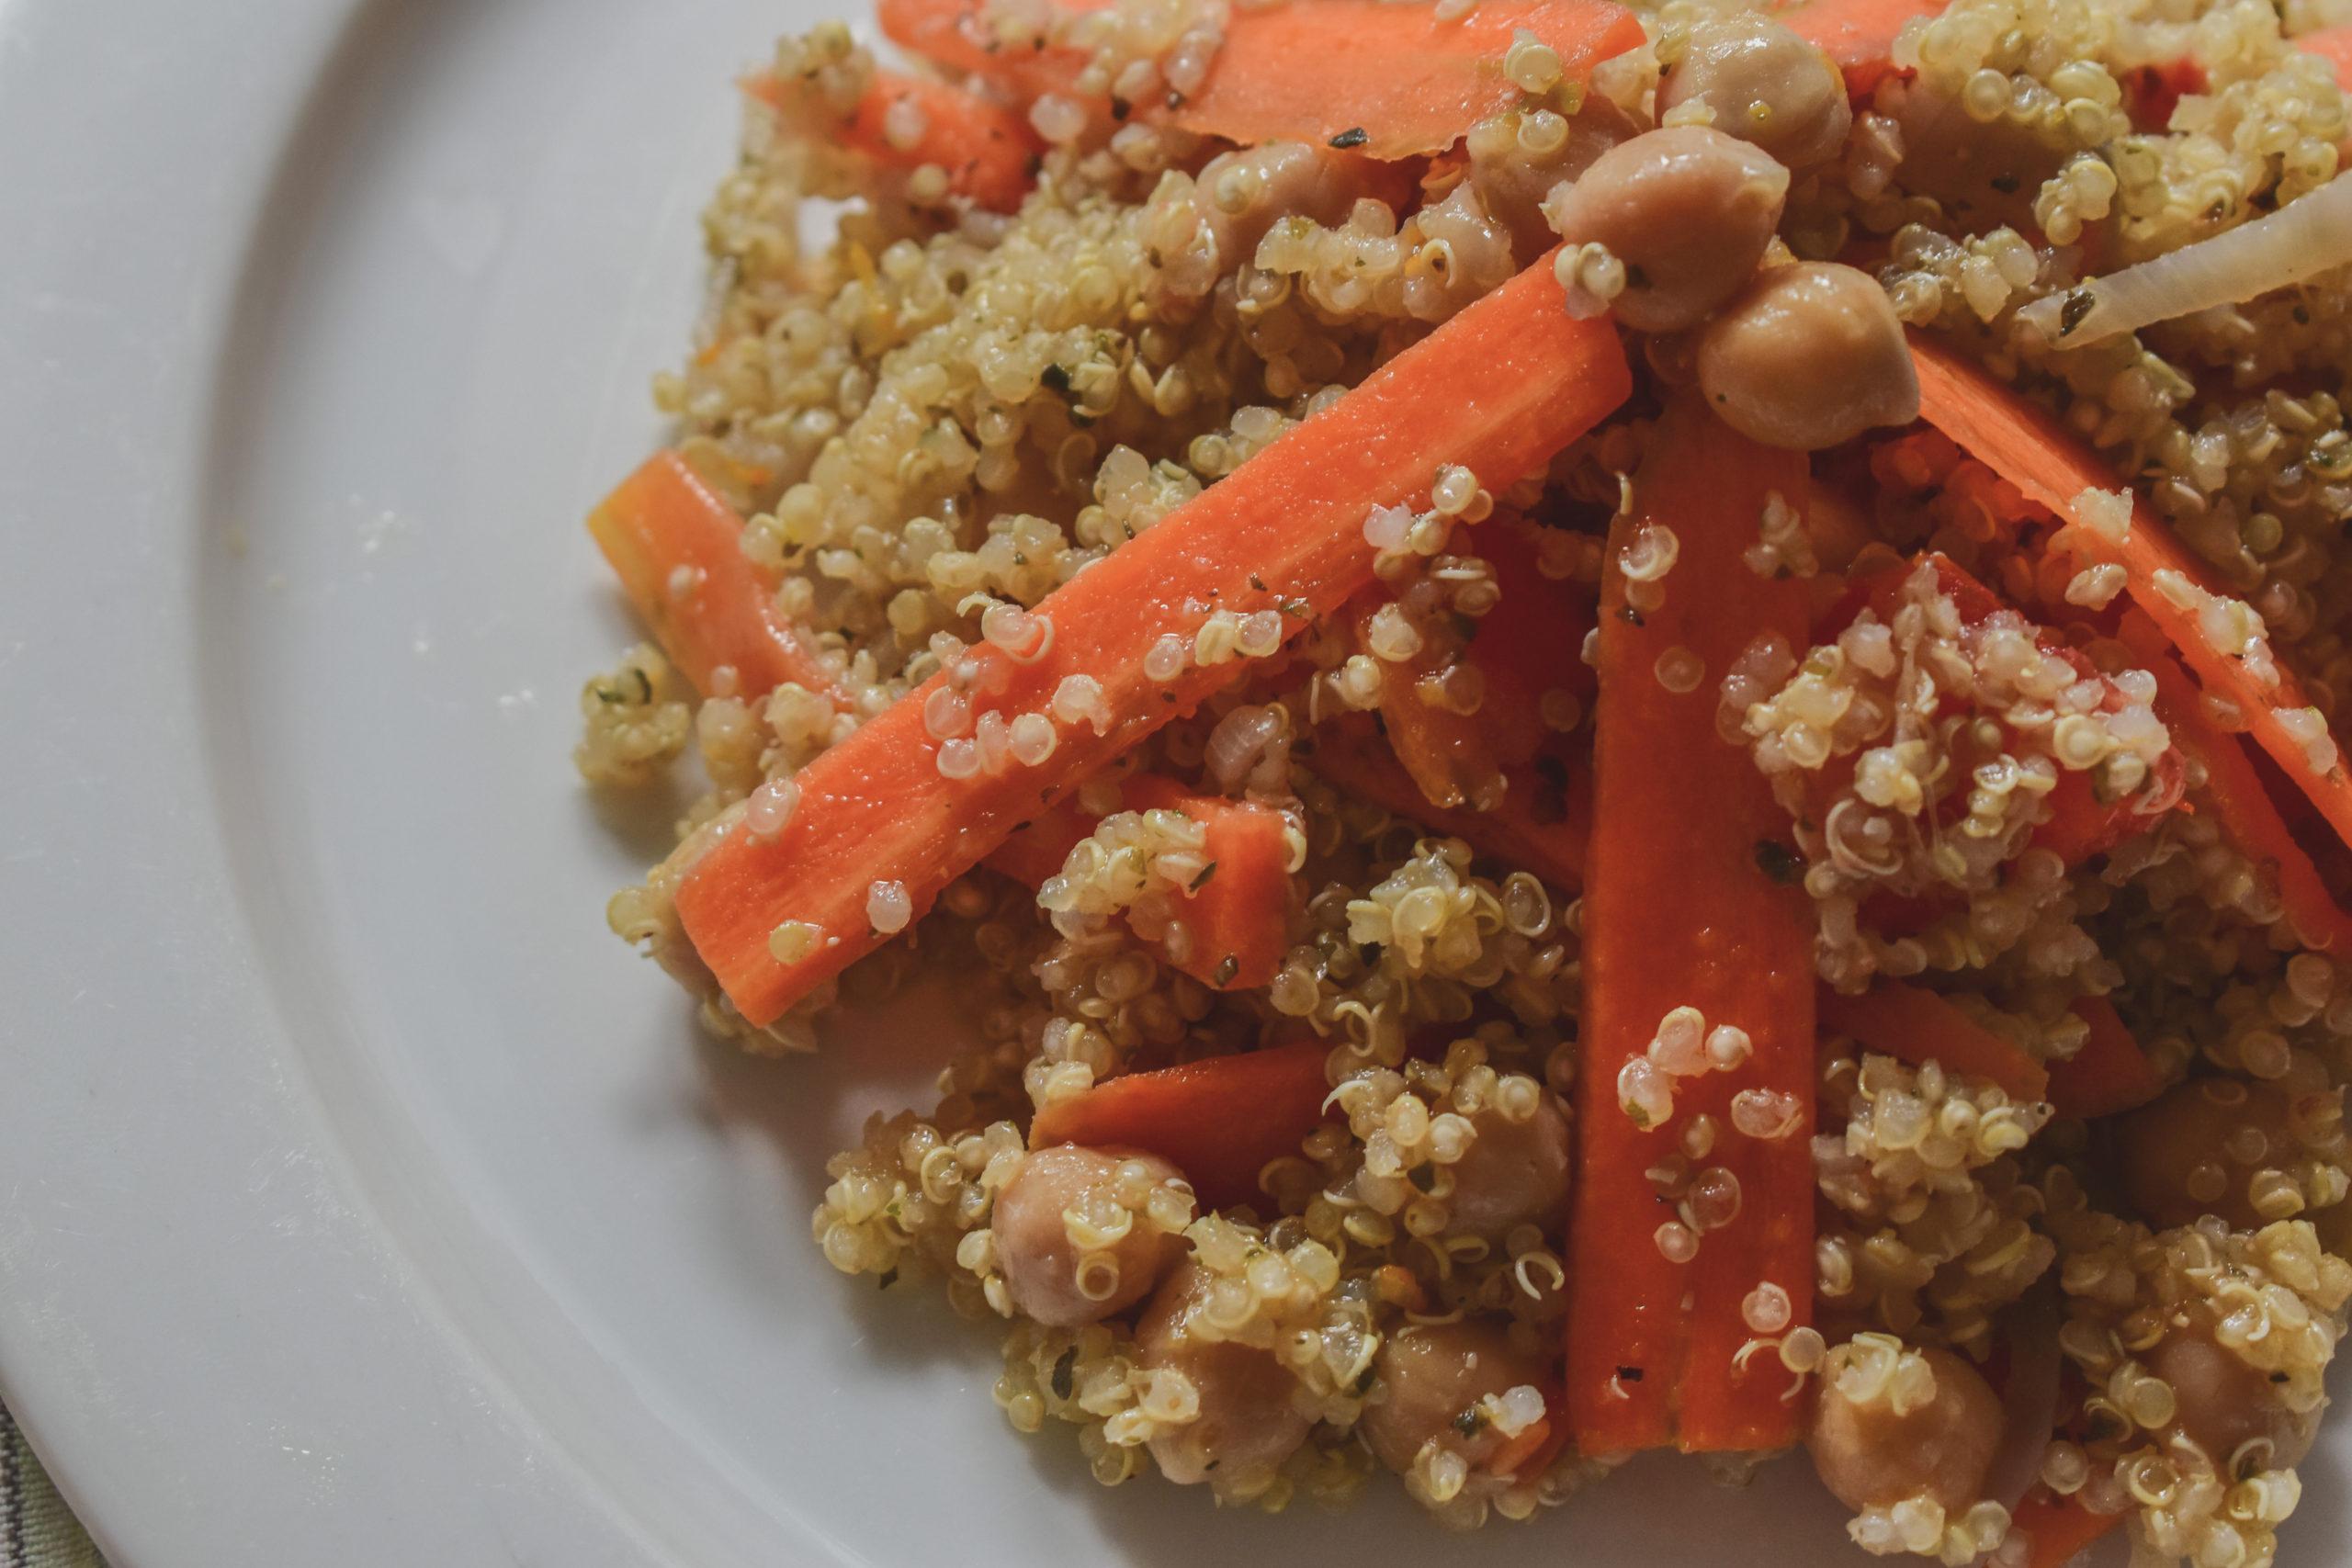 Quinoa and chickpeas salad